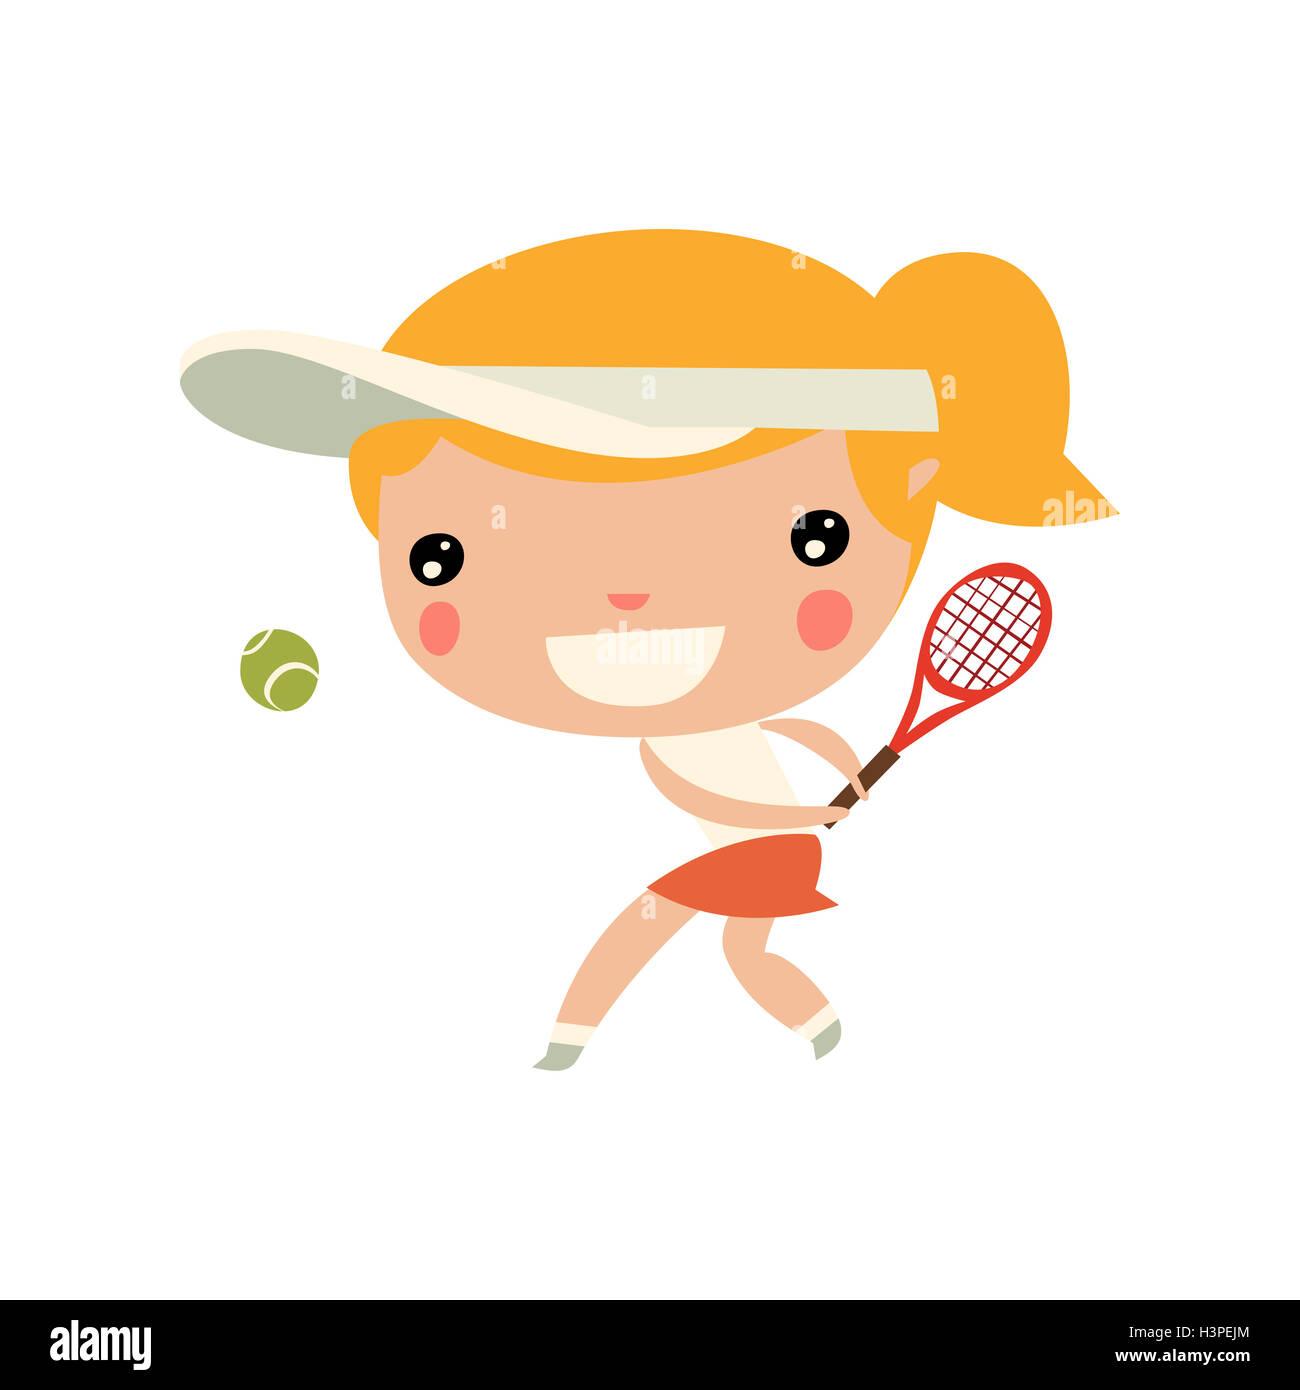 girl playing tennis. cute cartoon sports character. - Stock Image